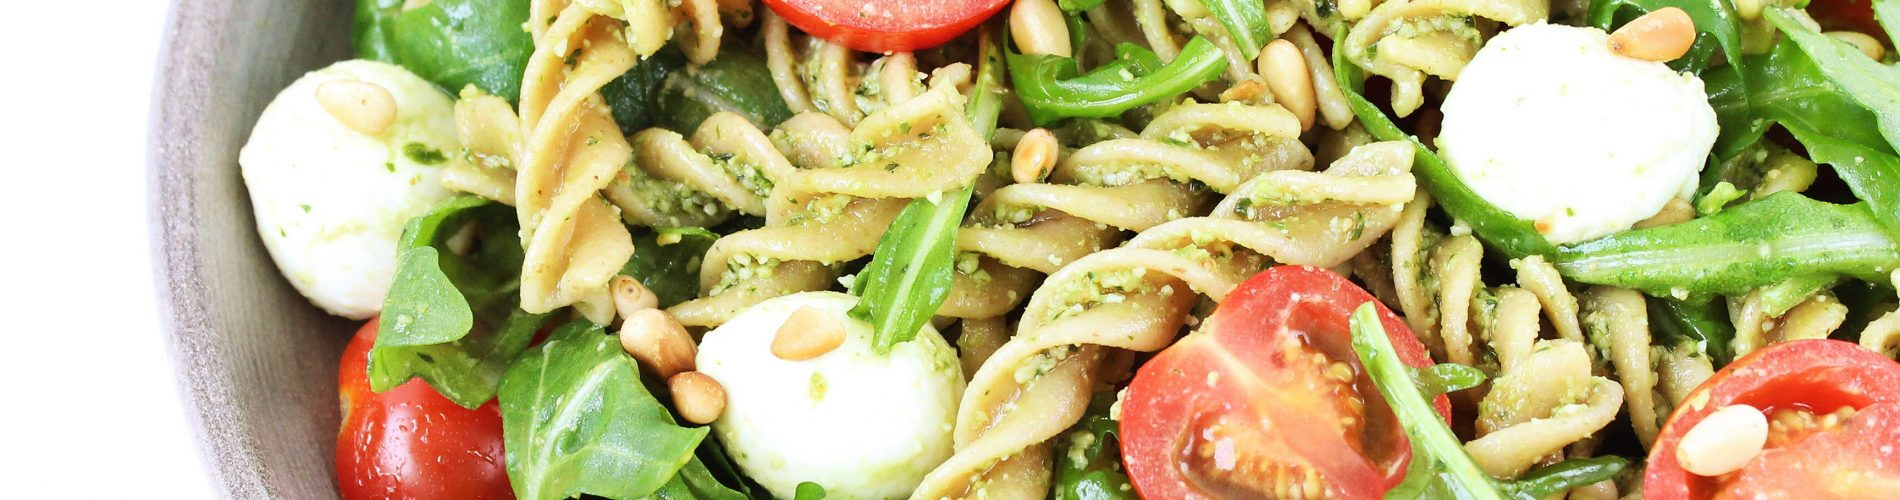 Caprese pastasalade met pesto